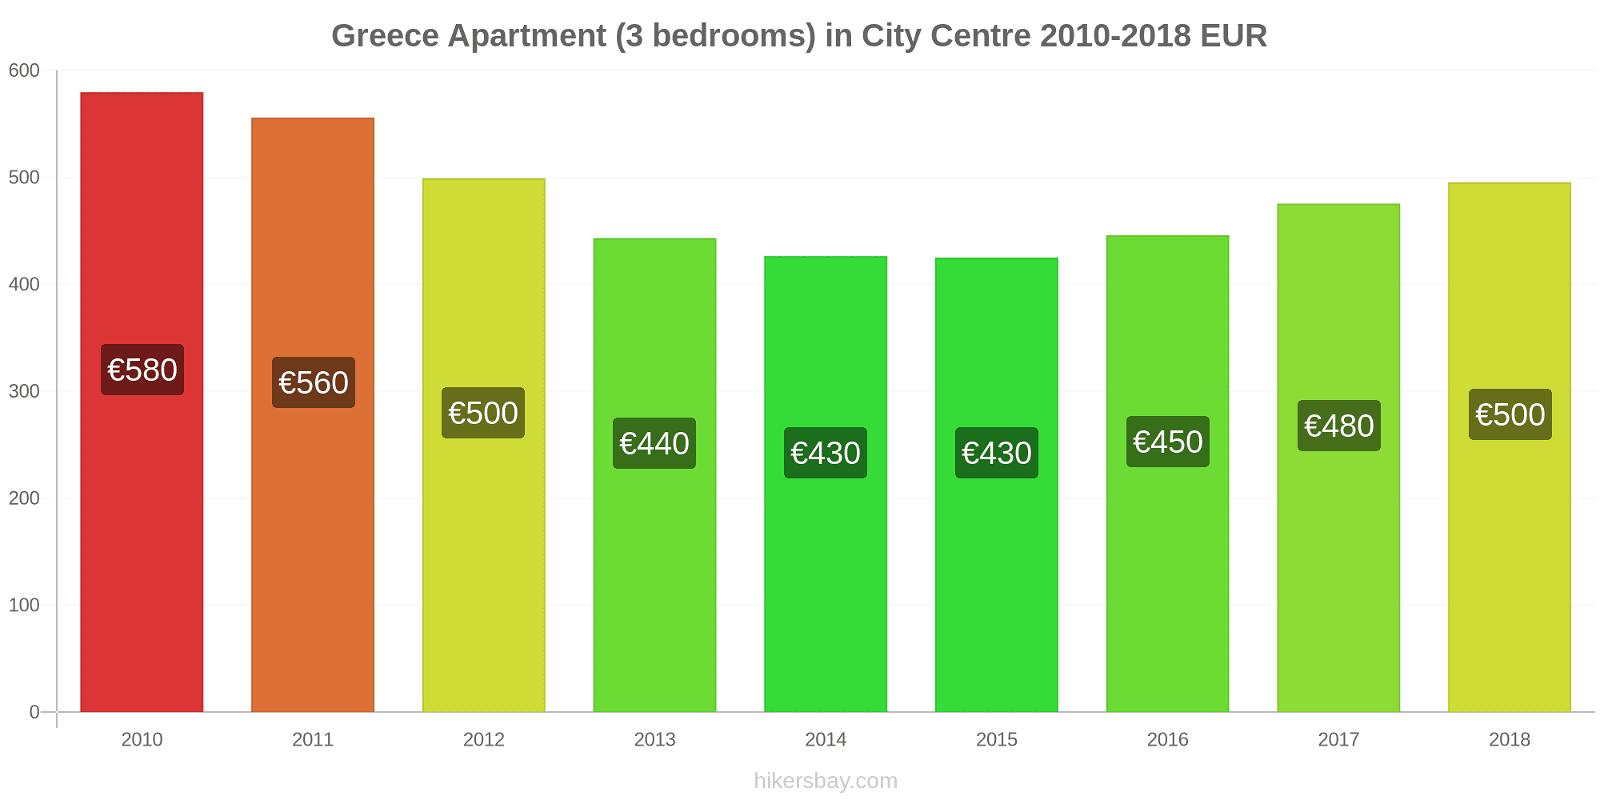 Greece price changes Apartment (3 bedrooms) in City Centre hikersbay.com